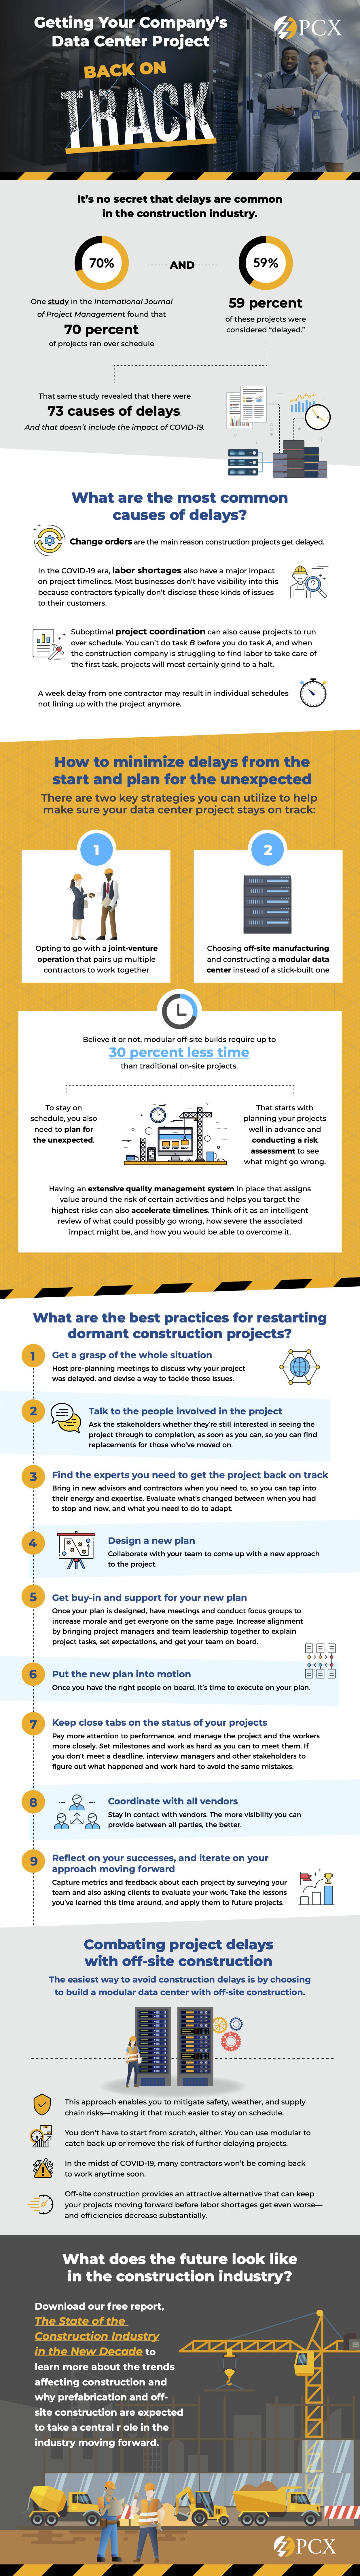 IG-PCX-Delayed-Construction